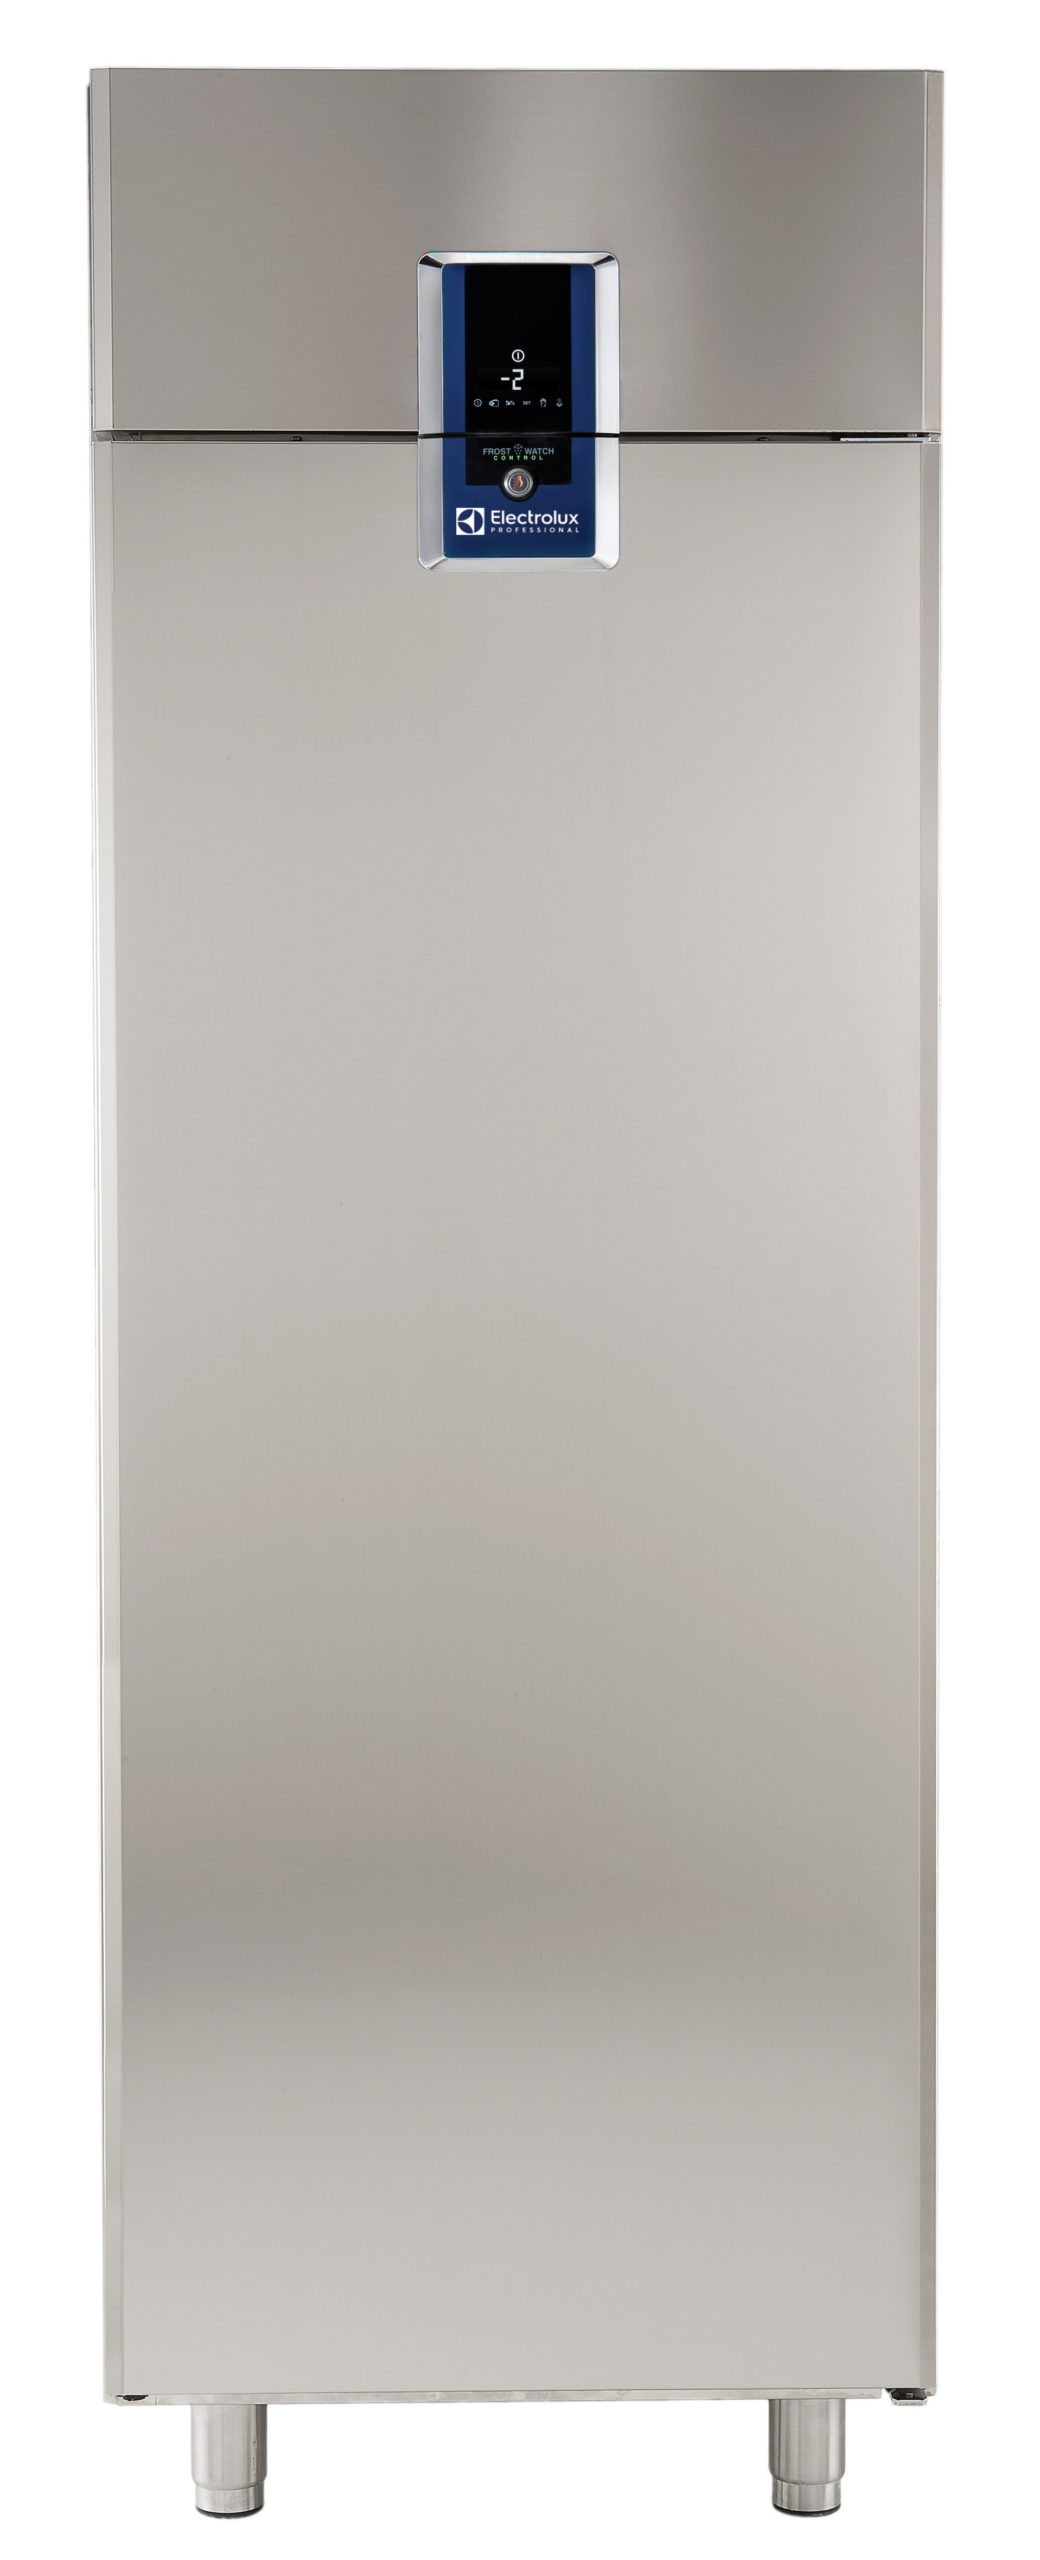 Electrolux ecostore Premium køleskabe – R290